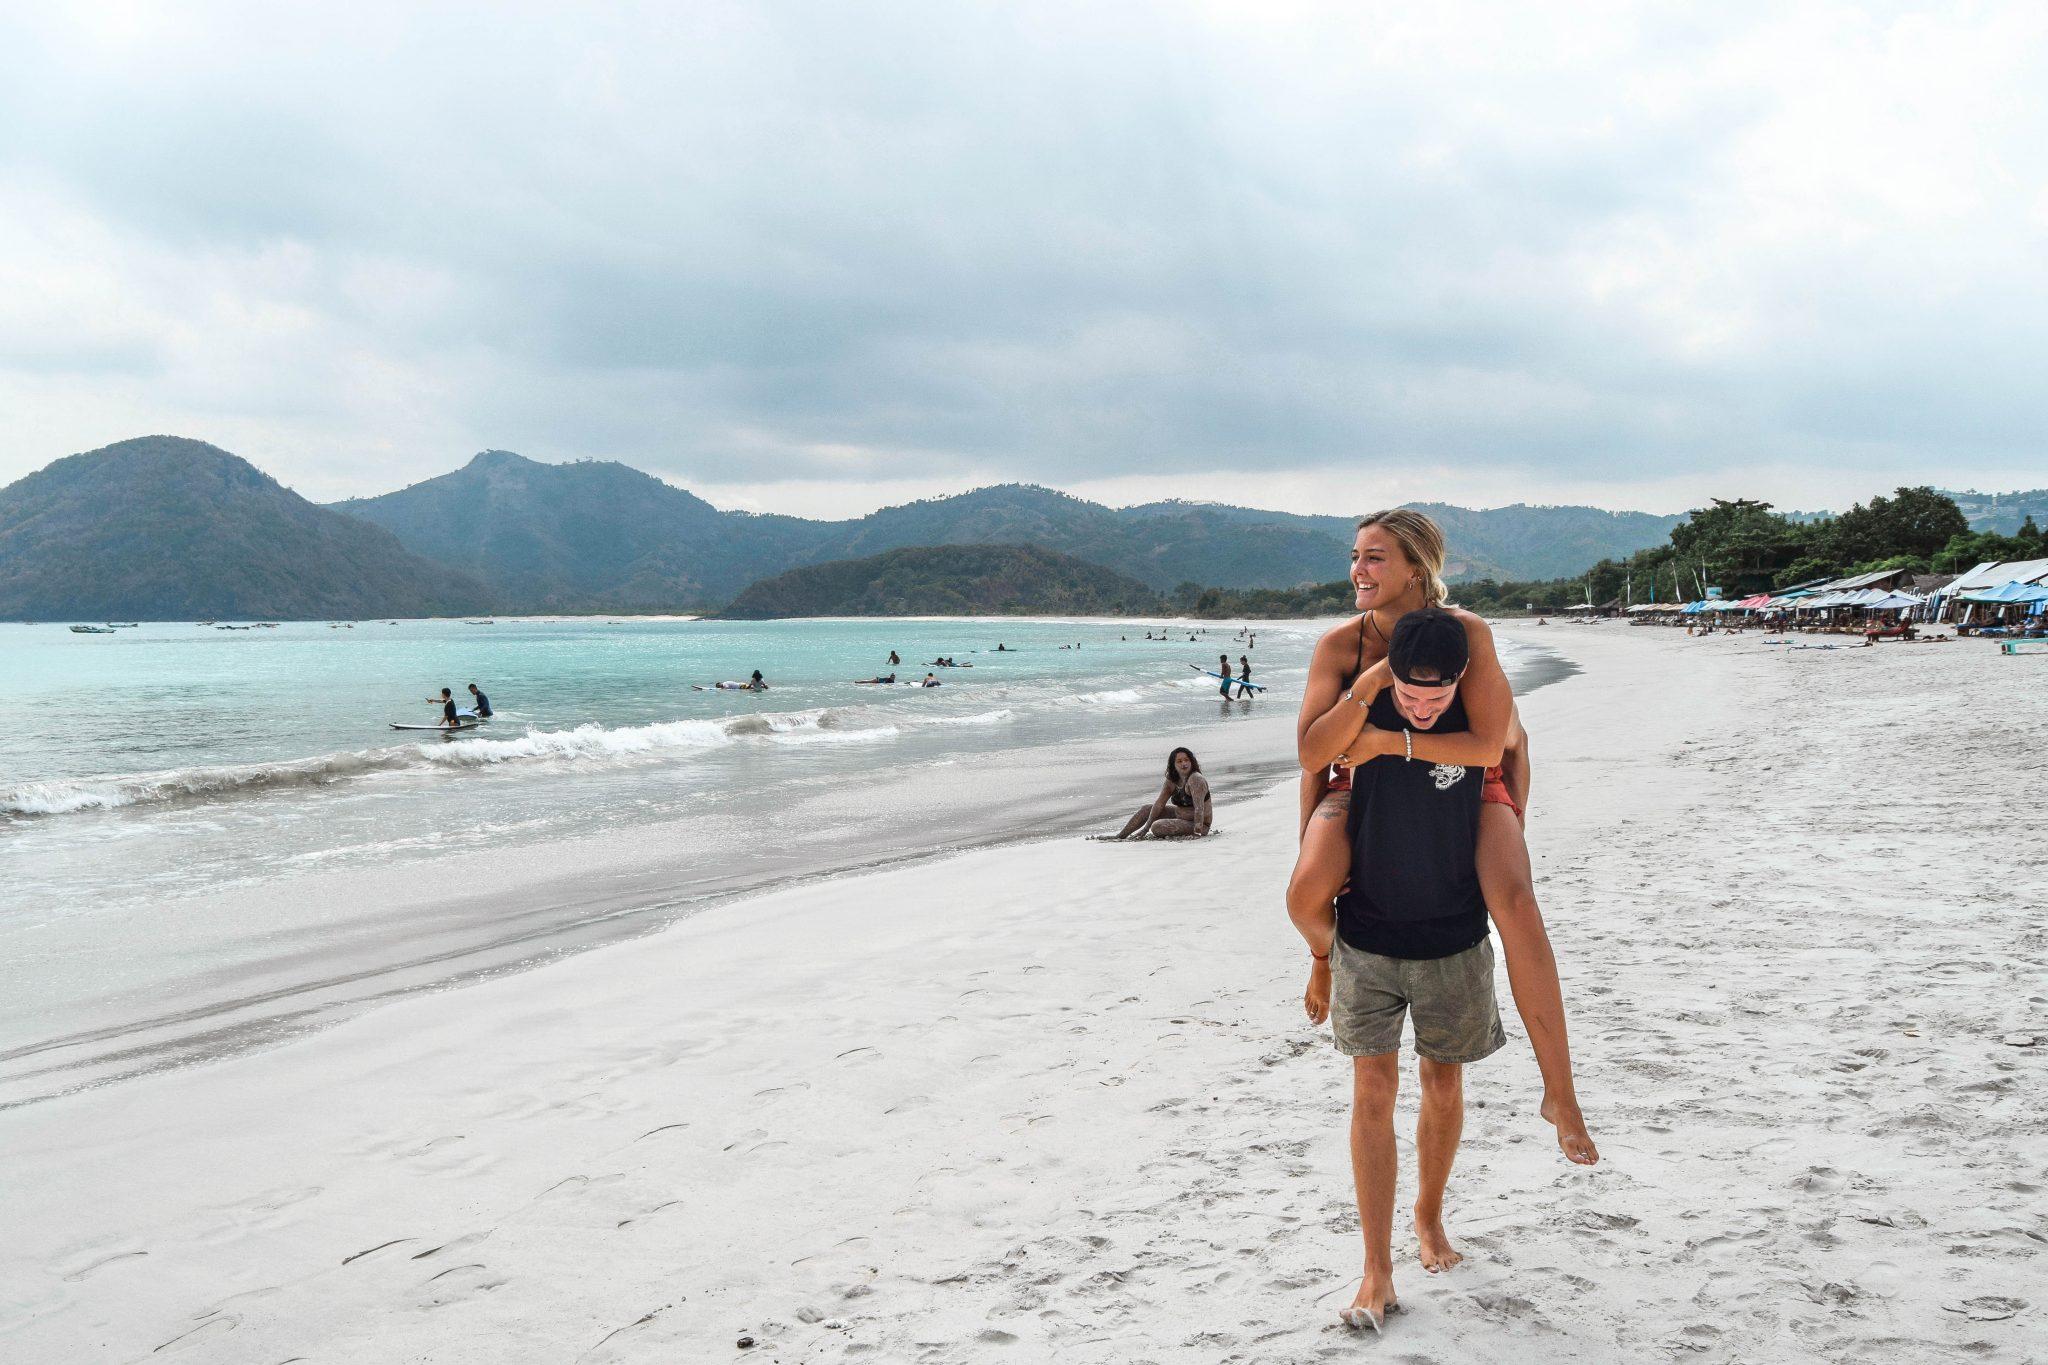 Wanderers & Warriors - Charlie & Lauren UK Travel Couple - Selong Belanak Beach Lombok Surfing - Learn To Surf In Lombok